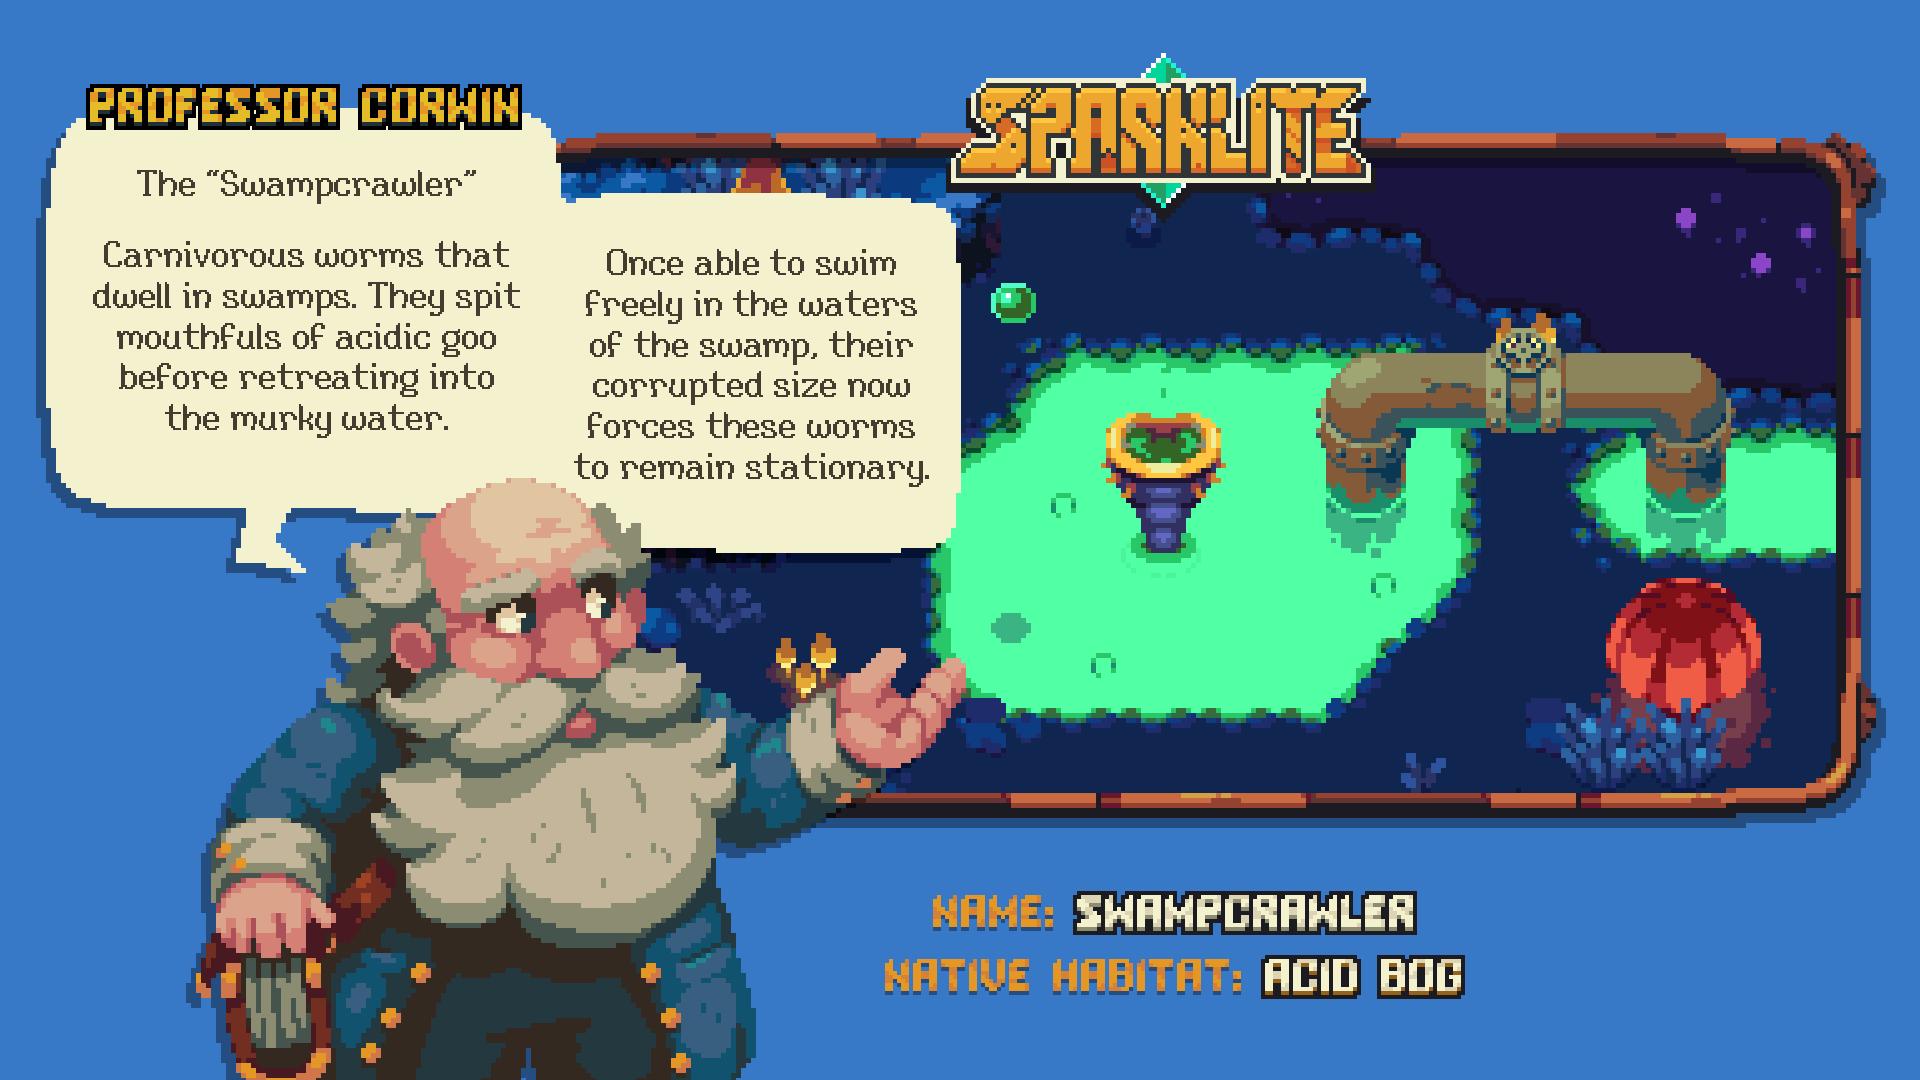 Sparklite Professor Corwin Swampcrawler Screenshot